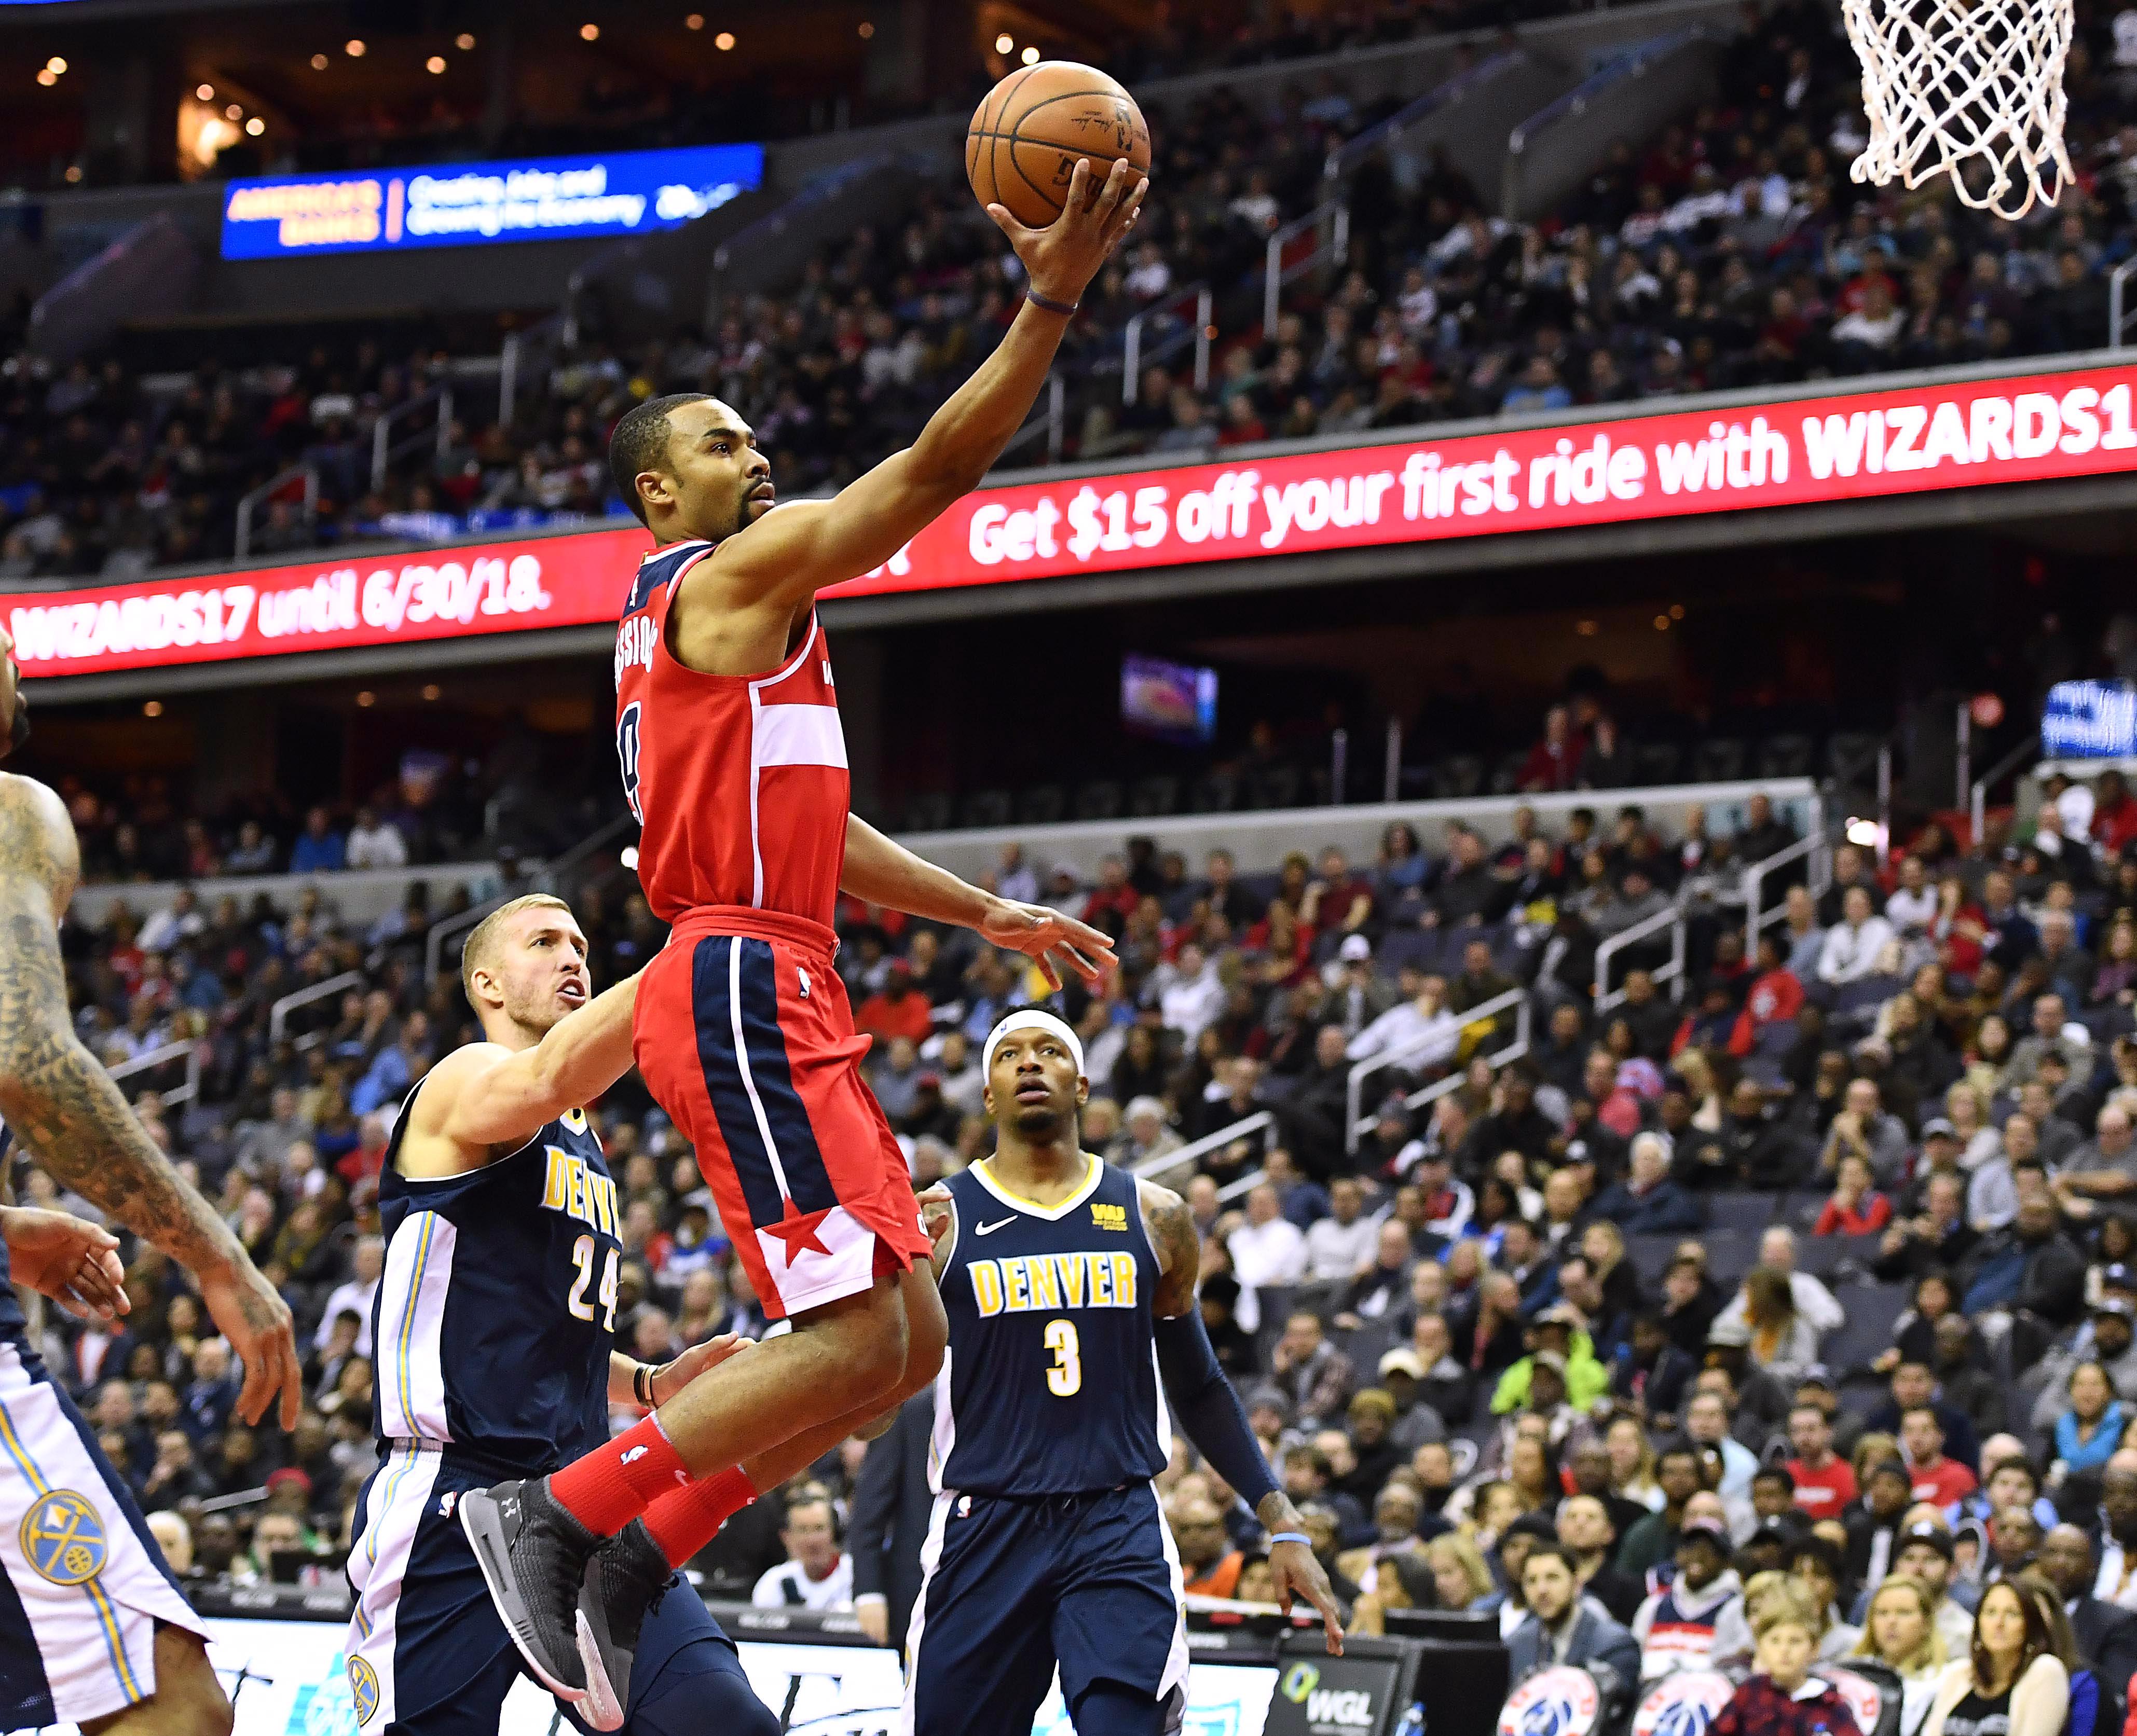 2017-18 Washington Wizards Report Card: Ramon Sessions